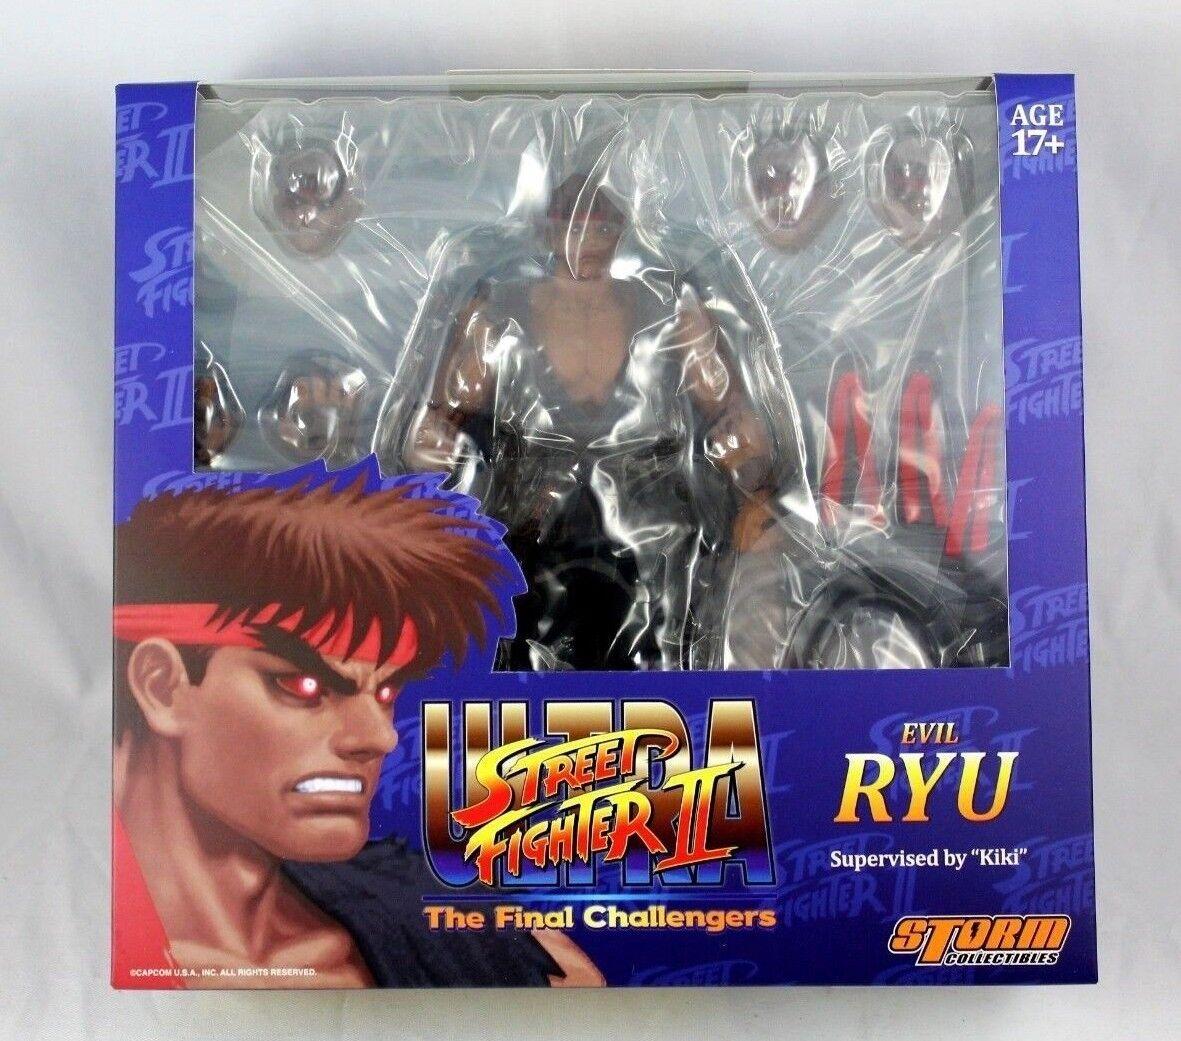 calidad fantástica Storm Coleccionables Street Fighter II Evil Evil Evil Ryu Figura 1 12 Escala Ultra  Disfruta de un 50% de descuento.